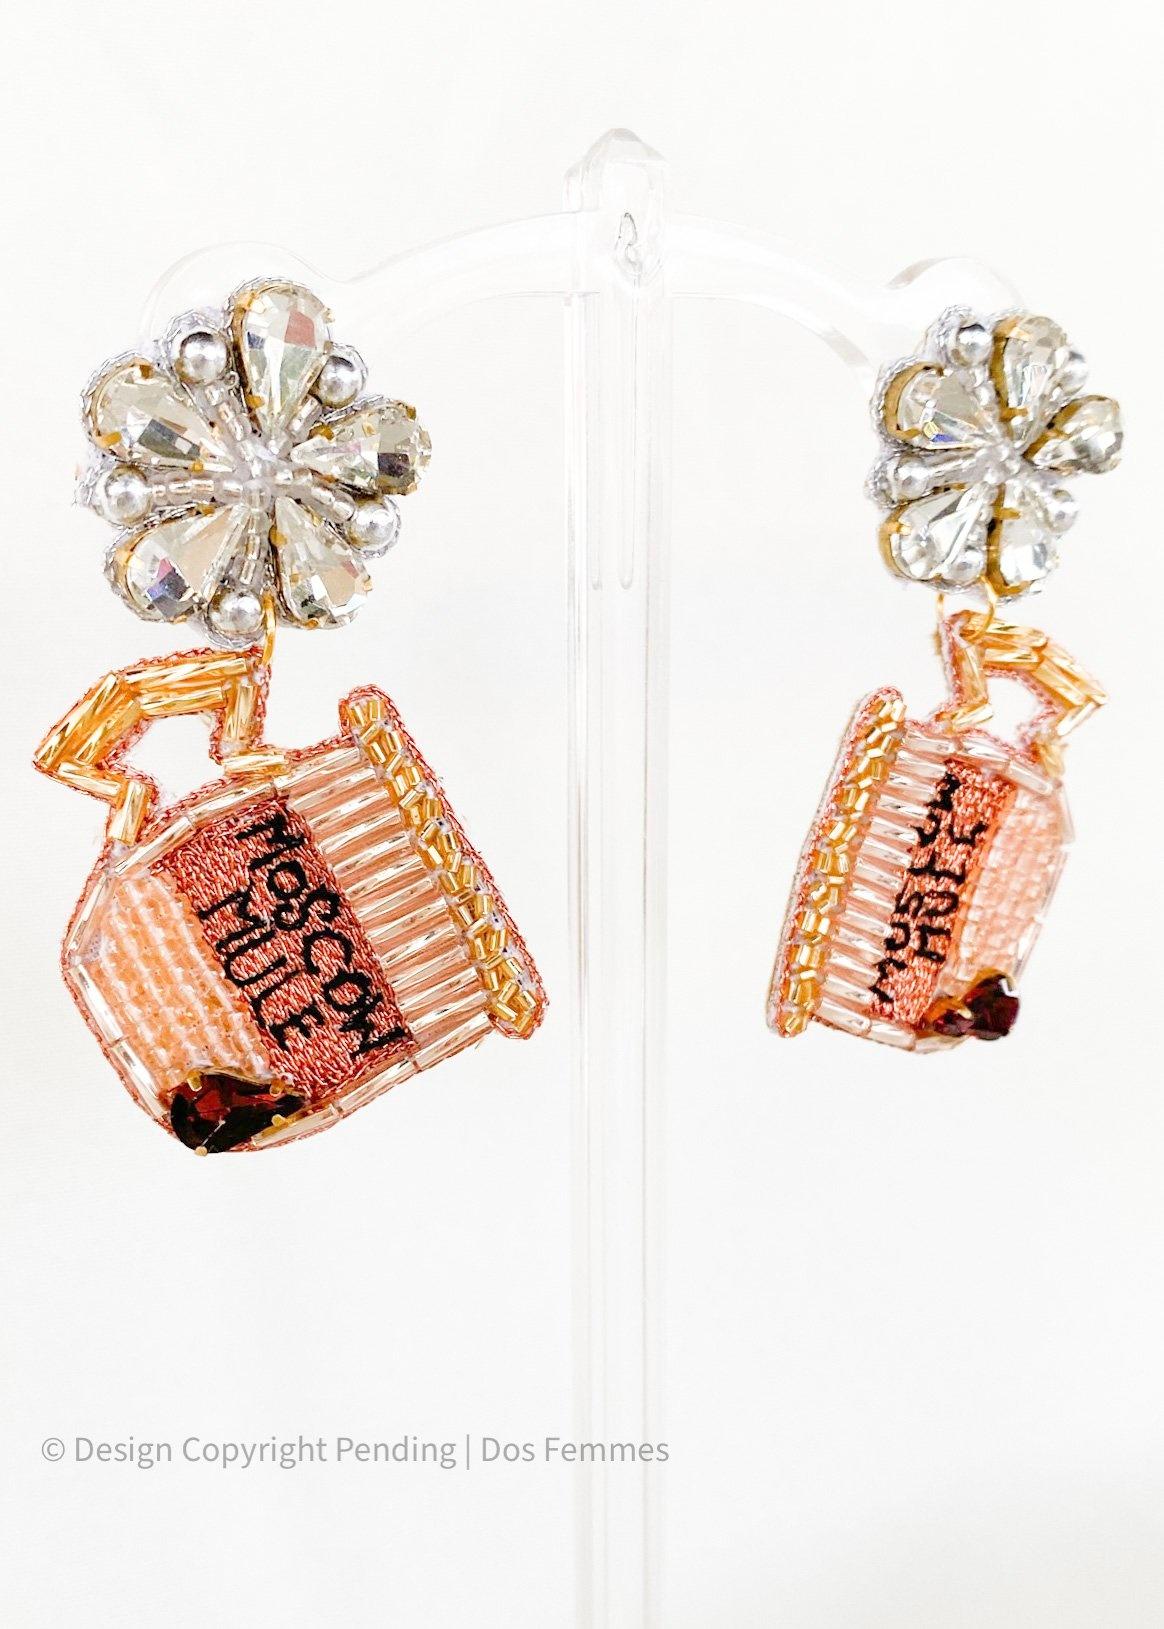 Dos Femmes Moscow Mule Earrings